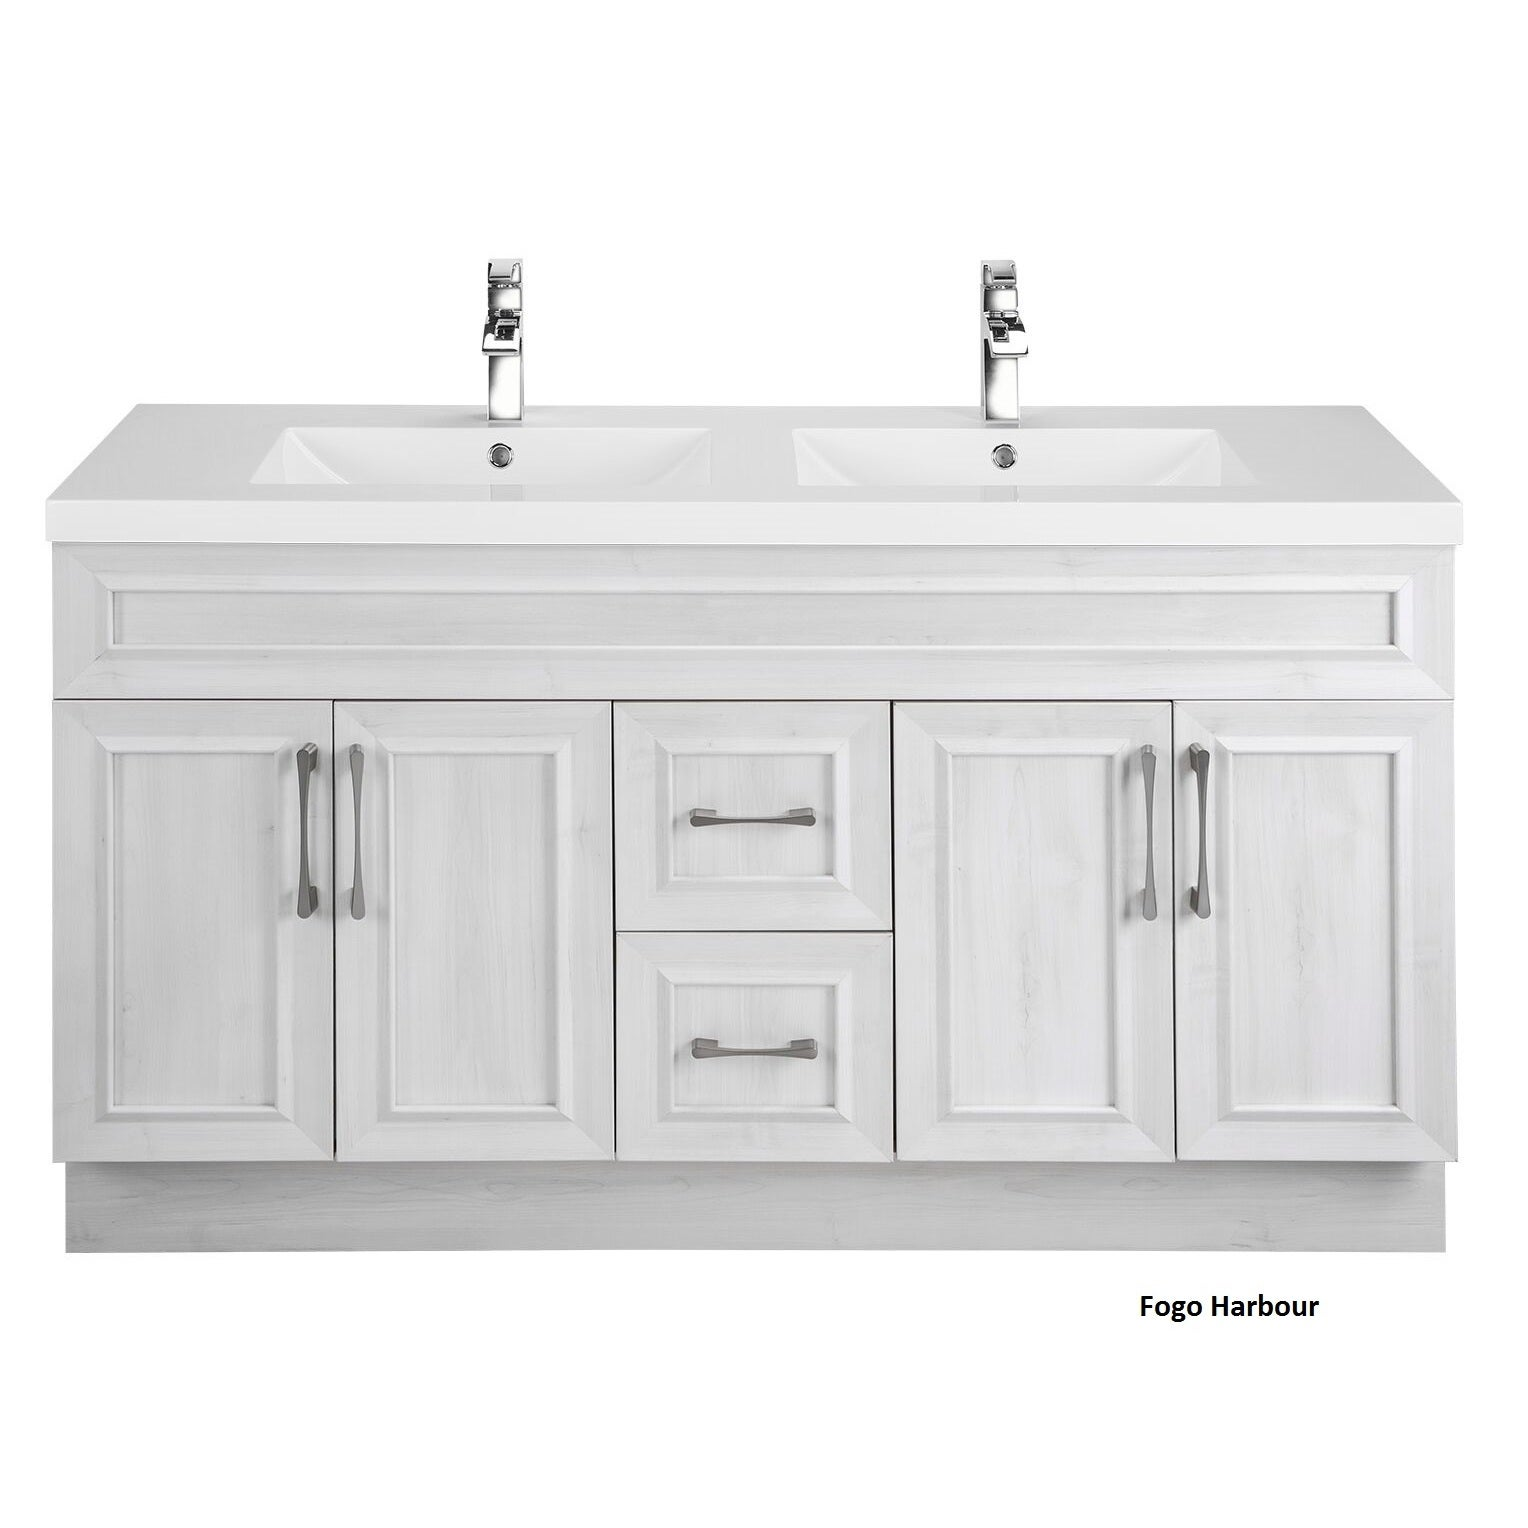 cutler cabinet amp kitchen silhouette chocolate medicine bath cabinets collection bay white